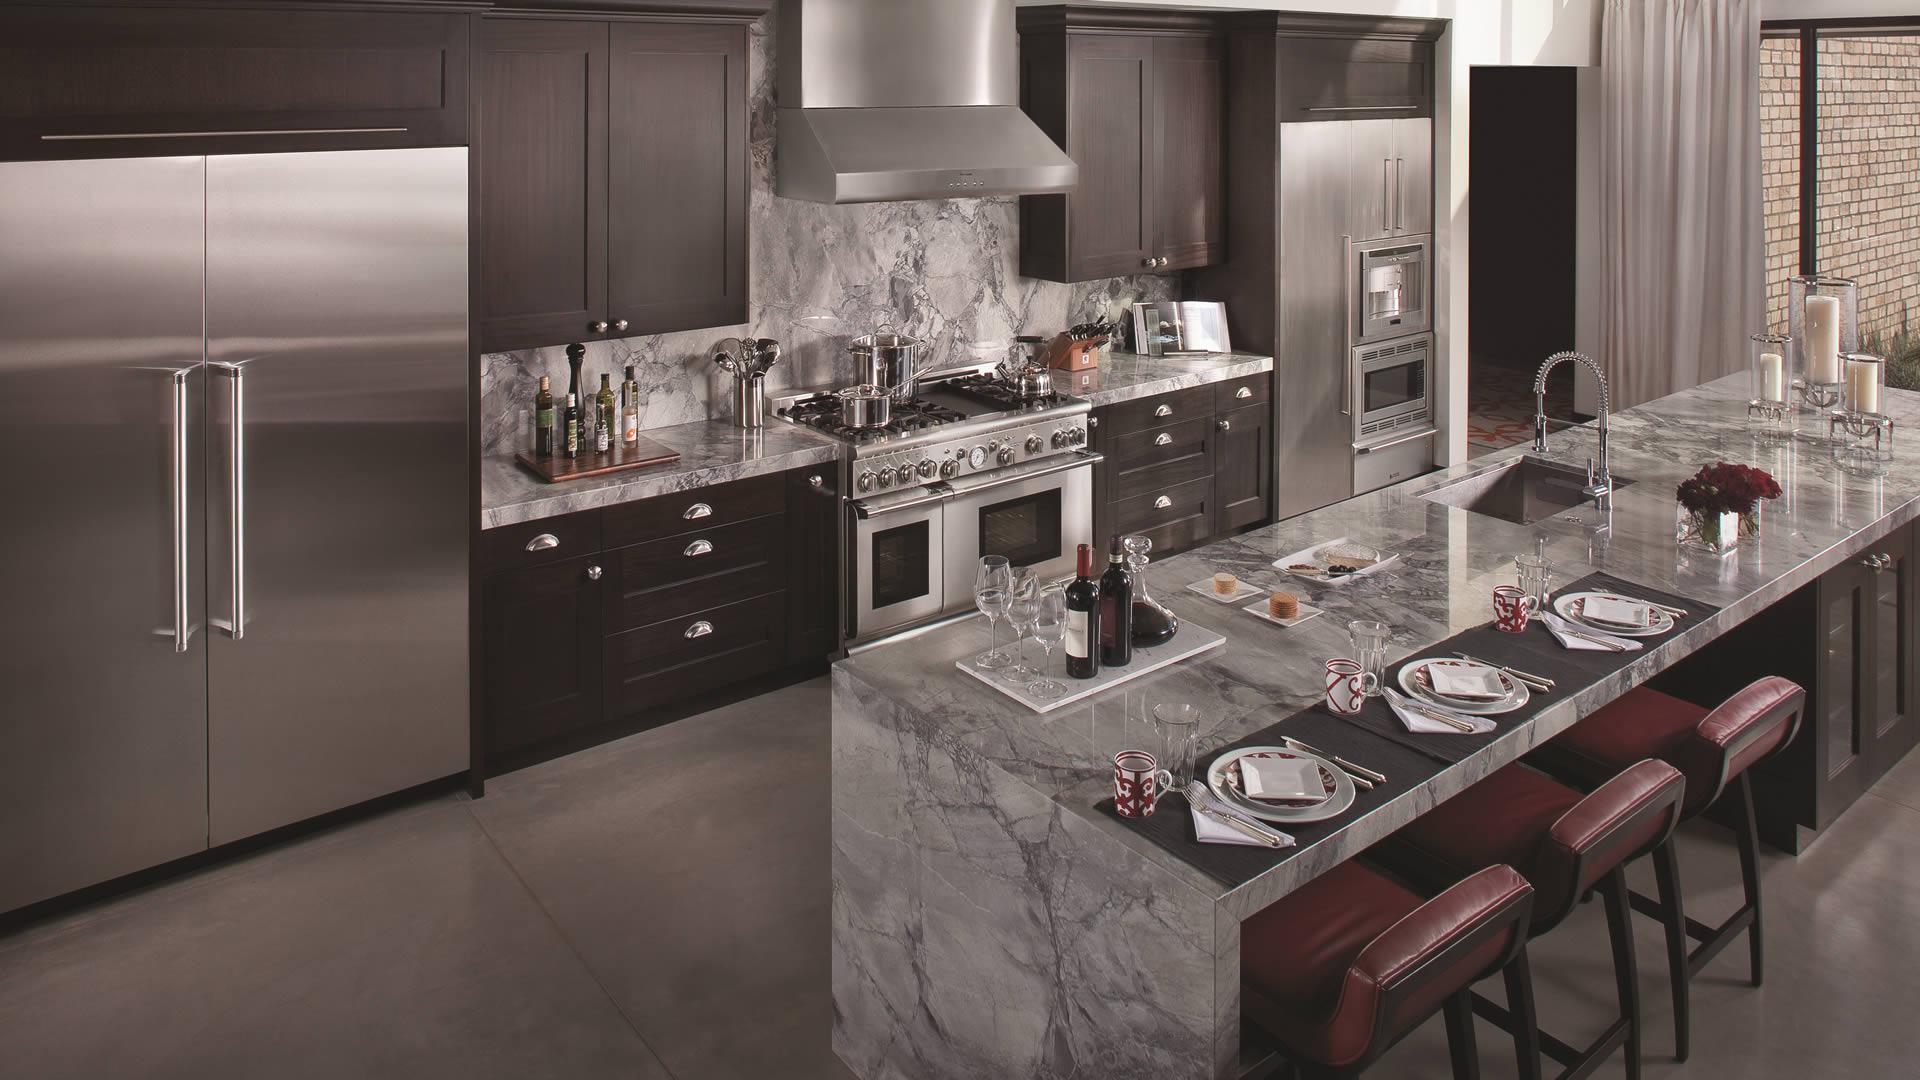 Thermador Fine Luxury Kitchen Appliances Nordic